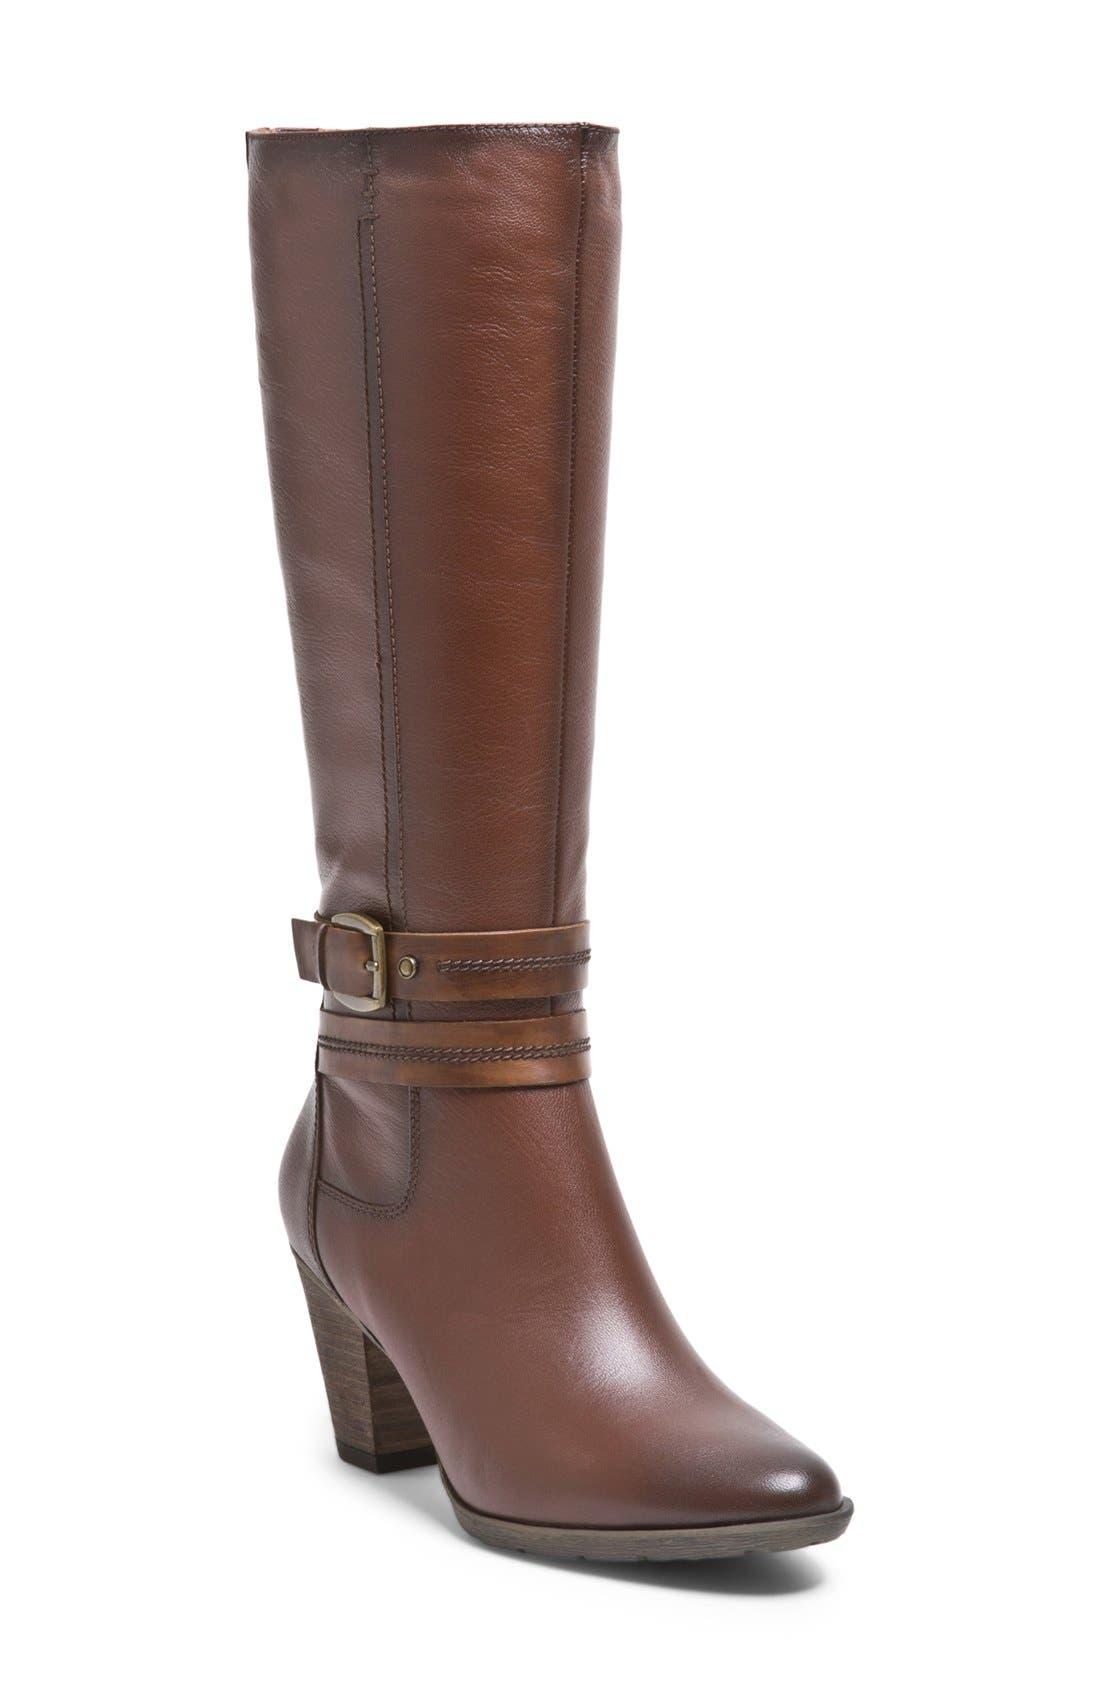 Alternate Image 1 Selected - Blondo 'Florane' Waterproof Leather Boot (Women)